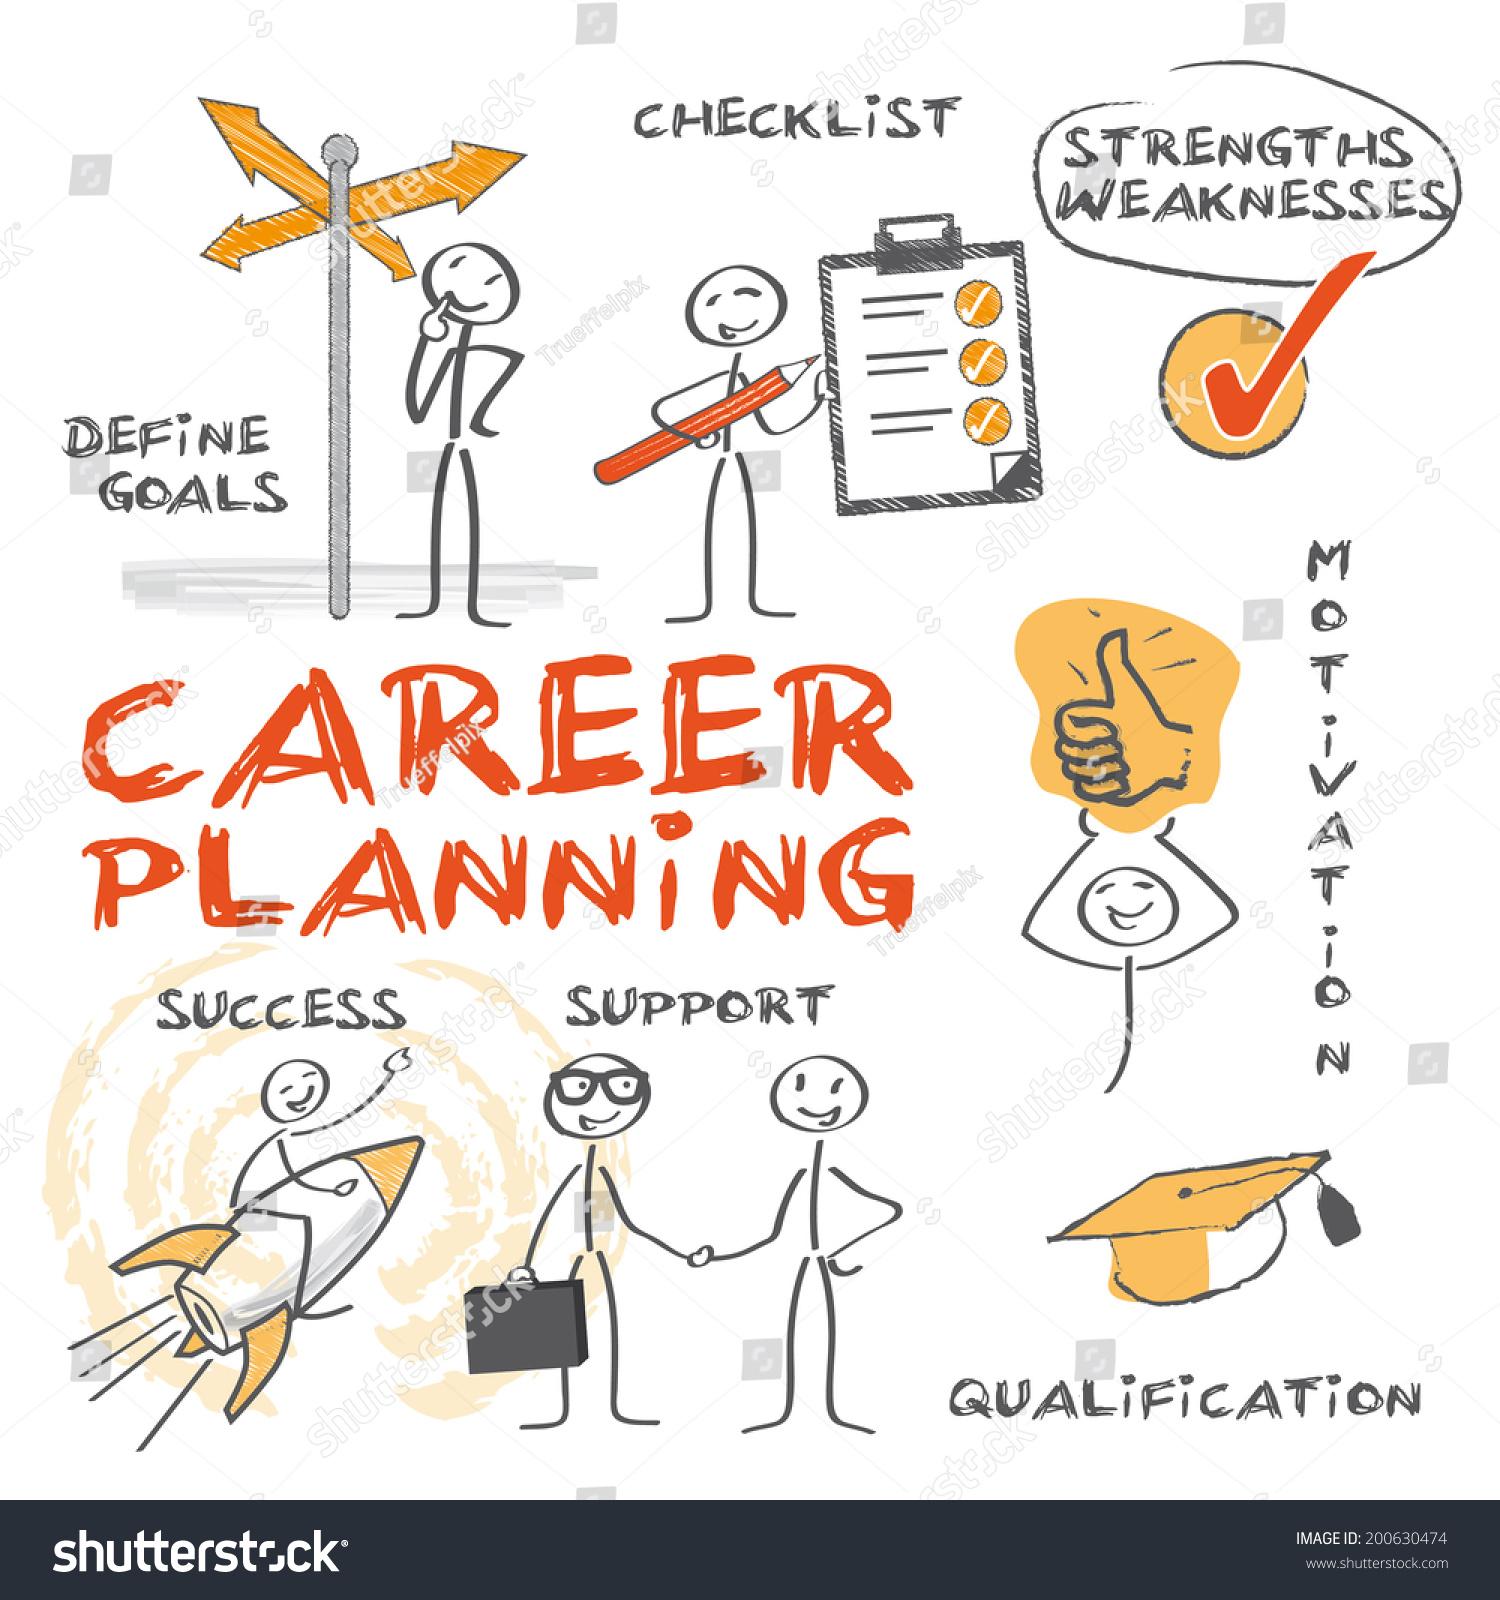 career planning chart keywords handdrawn figures stock vector career planning chart keywords and hand drawn figures